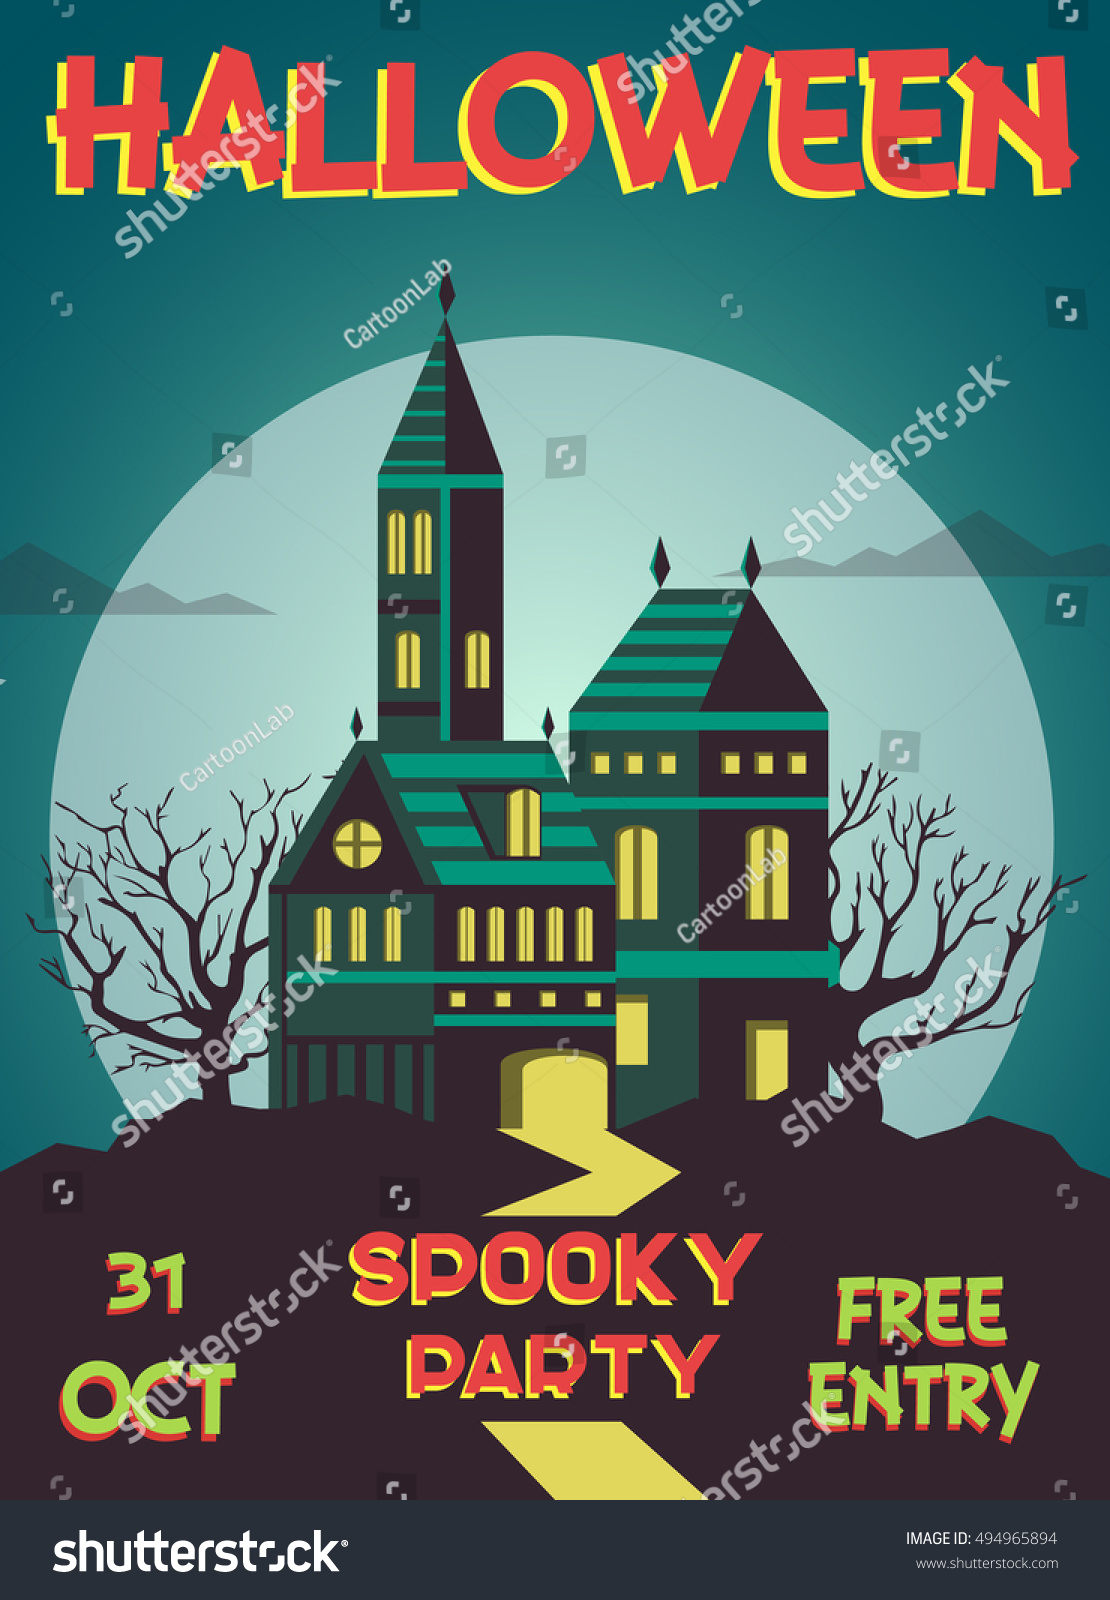 Spooky Halloween House, Halloween Invitation, Banner ,post Card, Poster.  Spooky